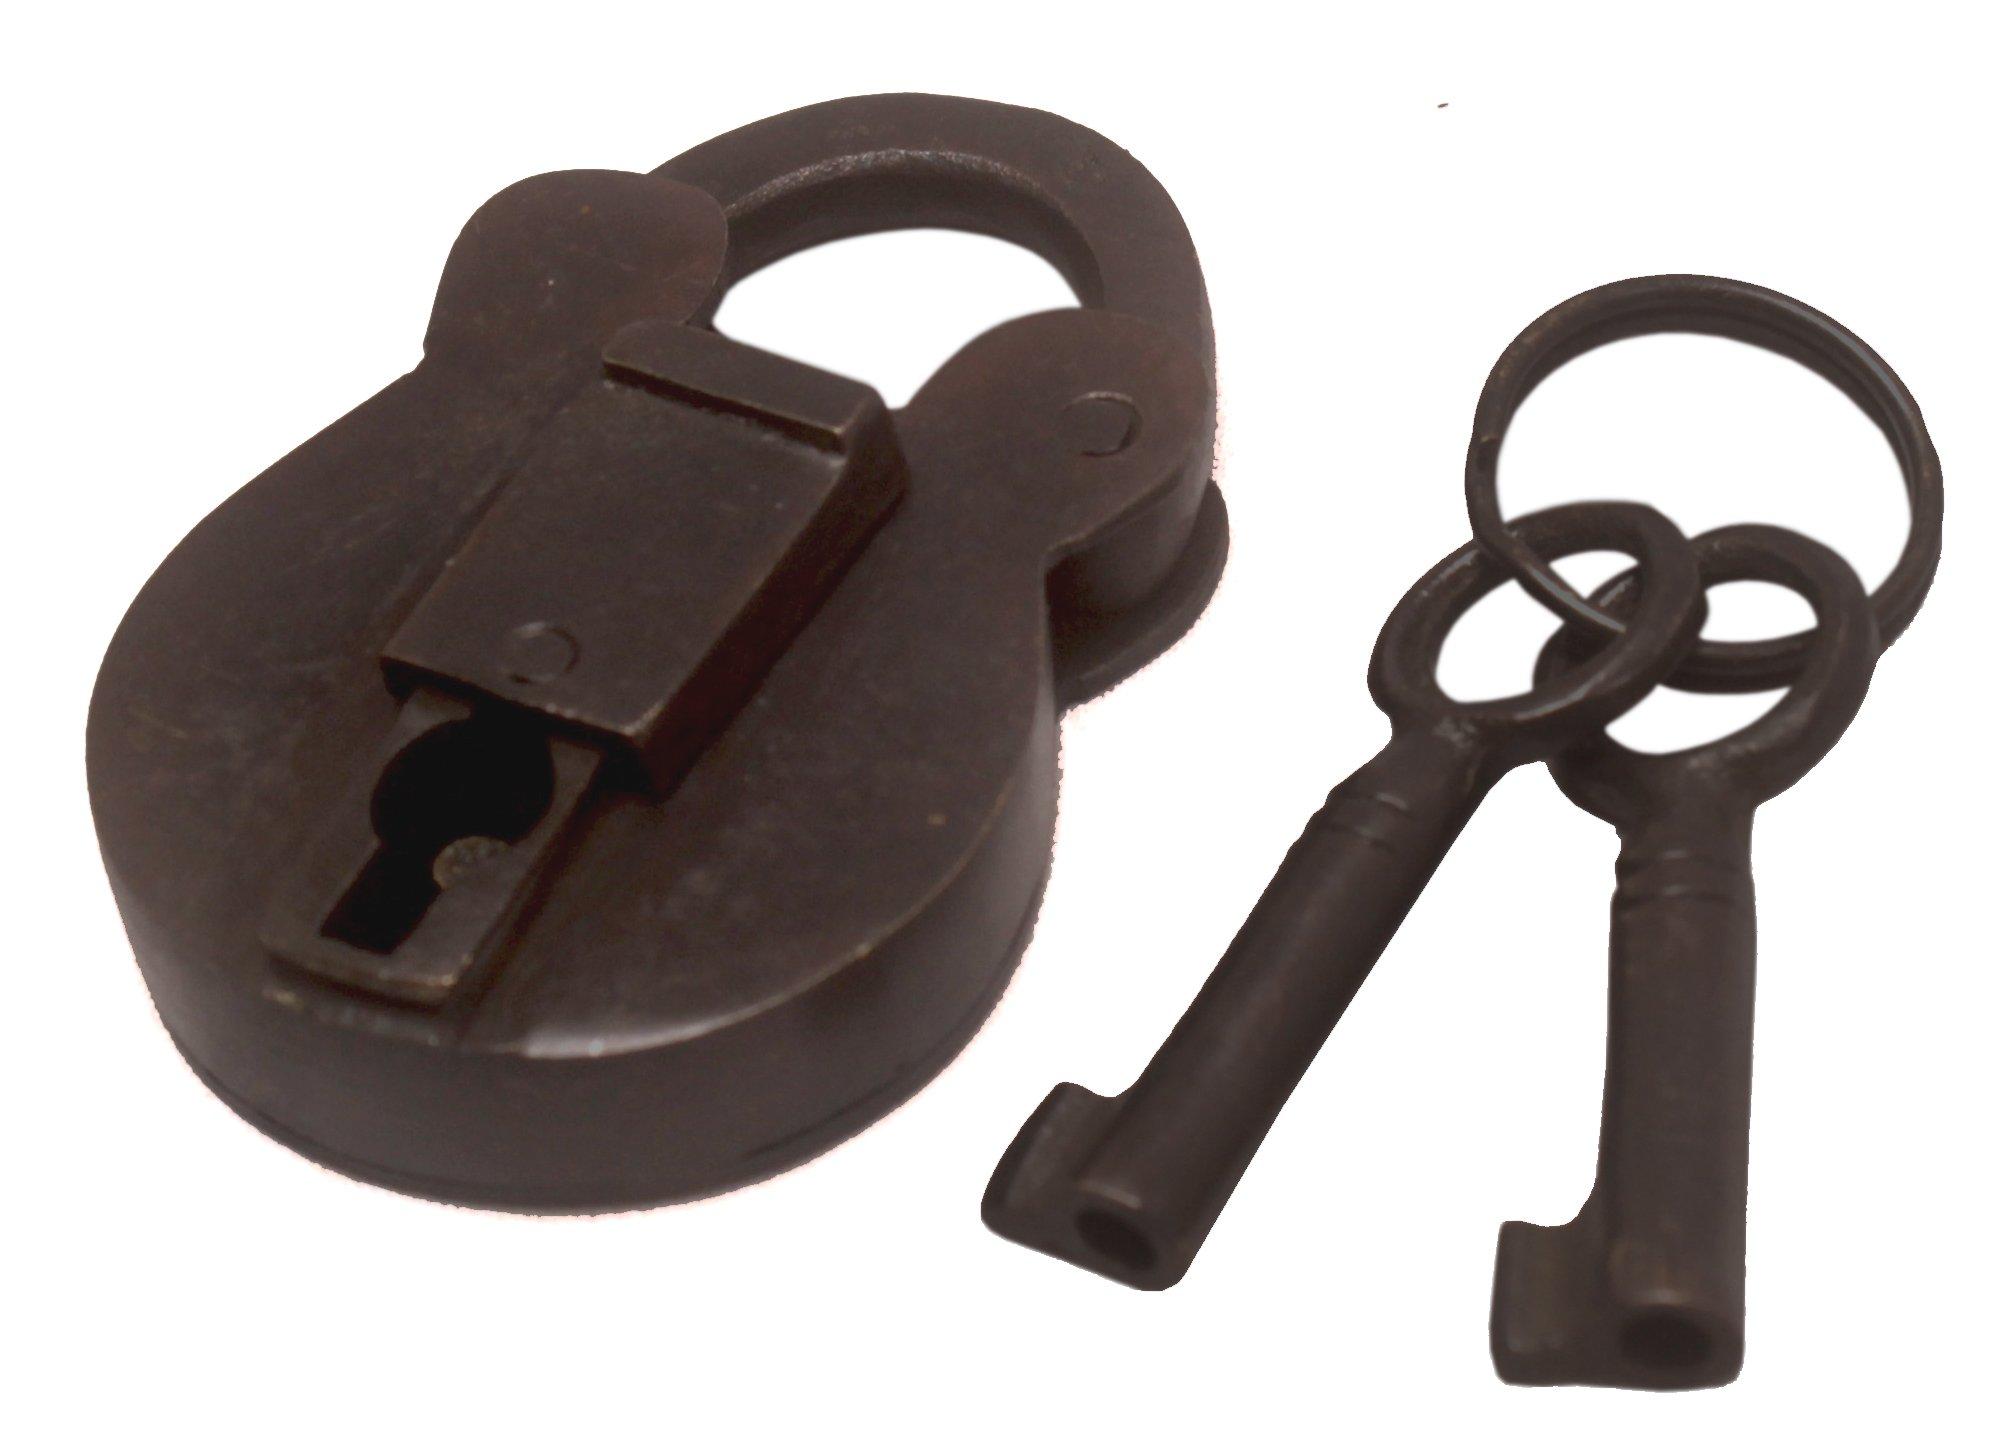 Nesha Antique Style Padlock With Keys Small